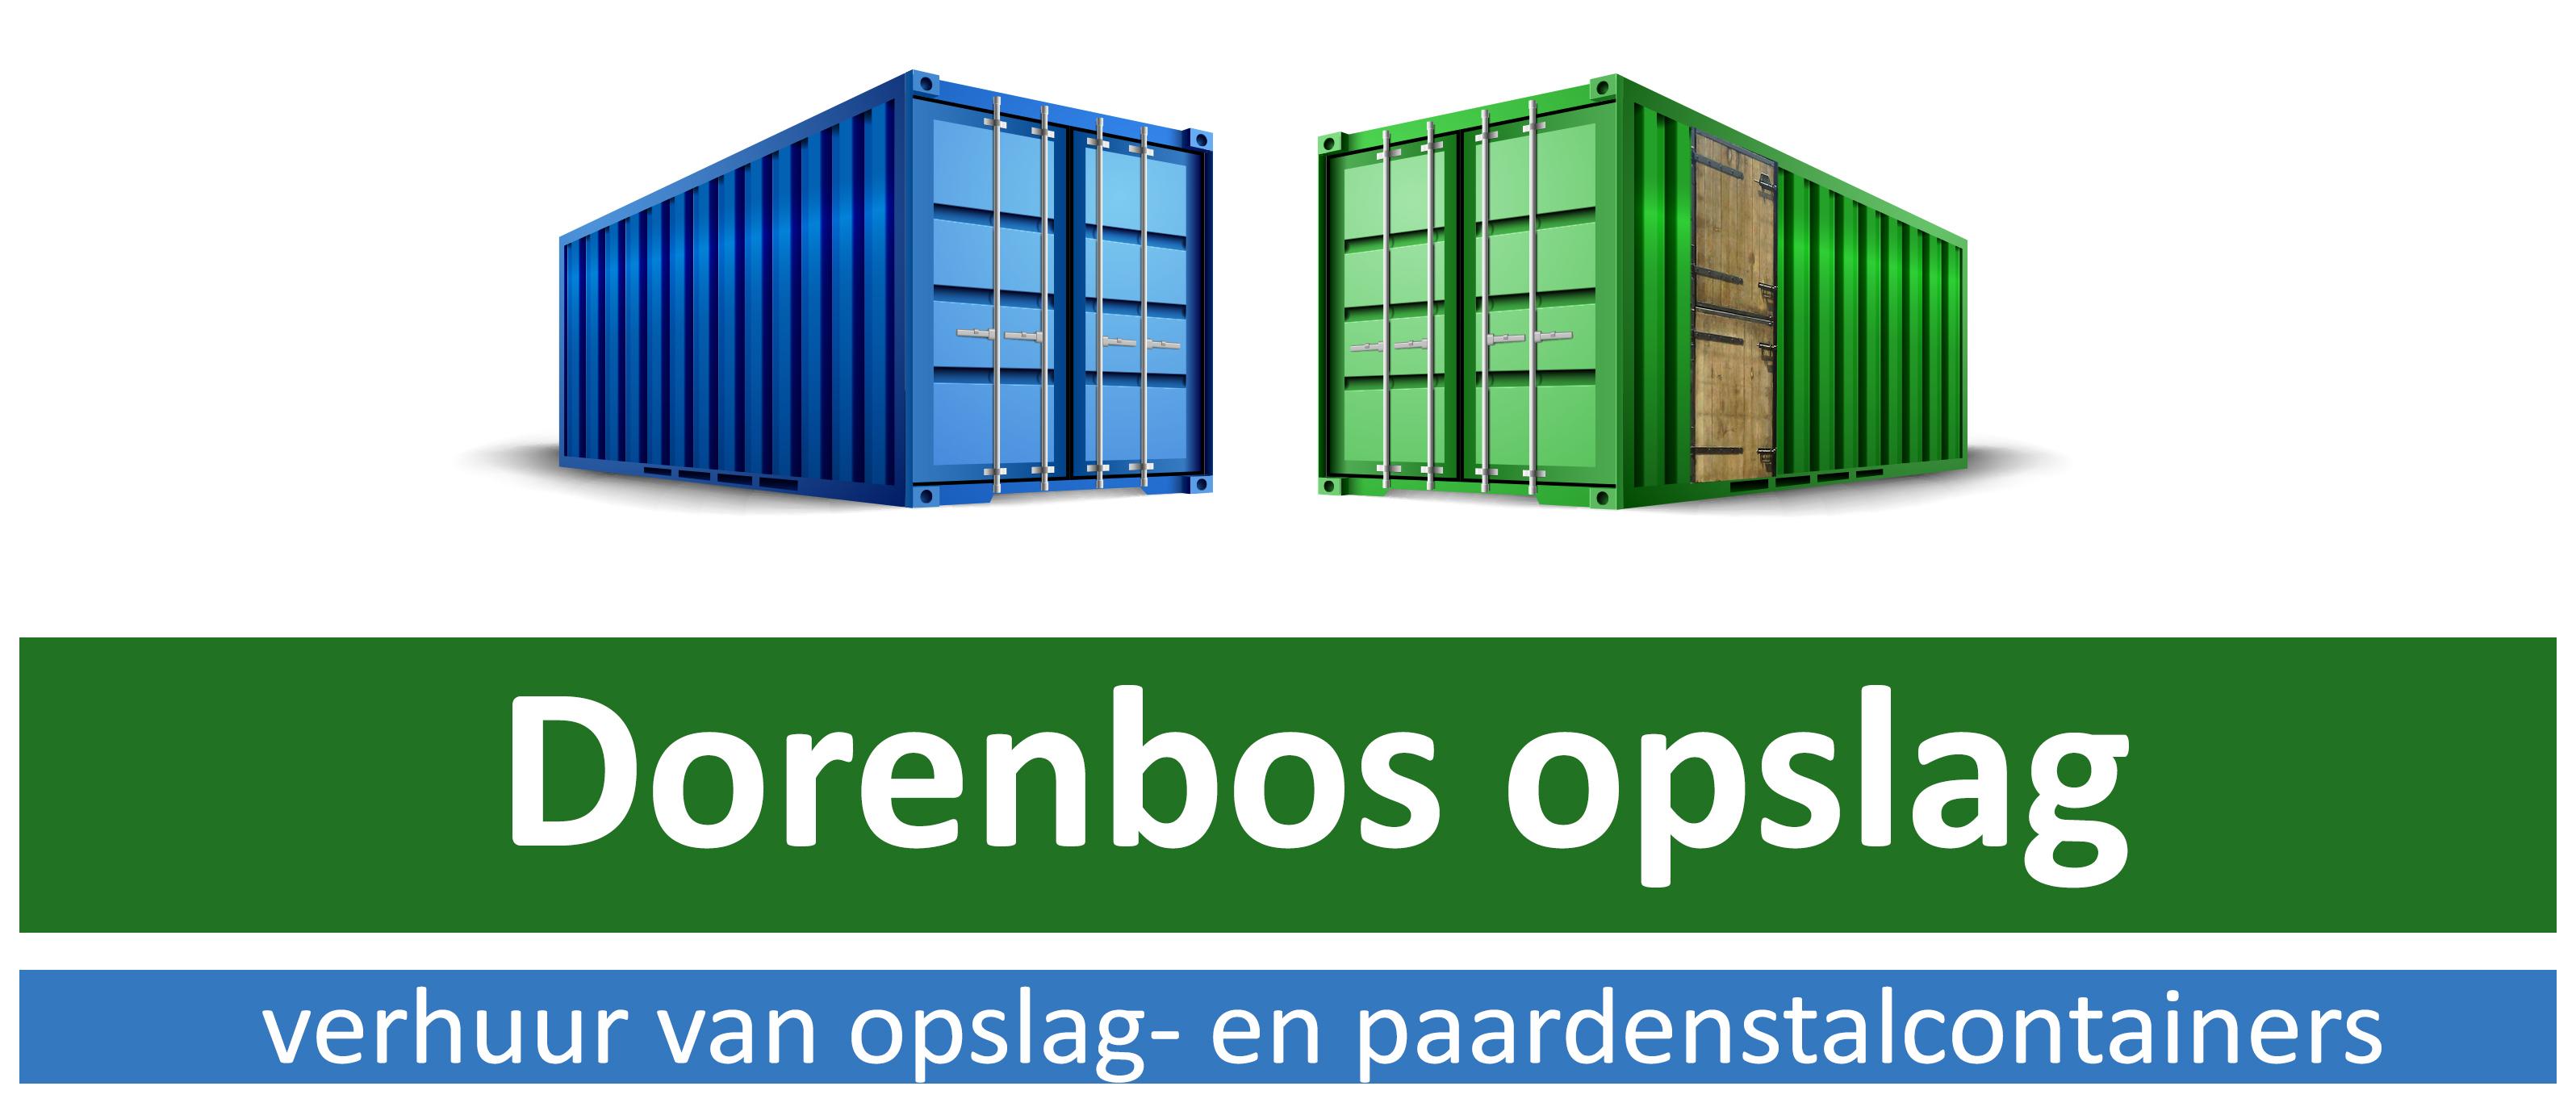 Dorenbos Opslag | Opslagcontainers | Paardenstalcontainers | Verhuur